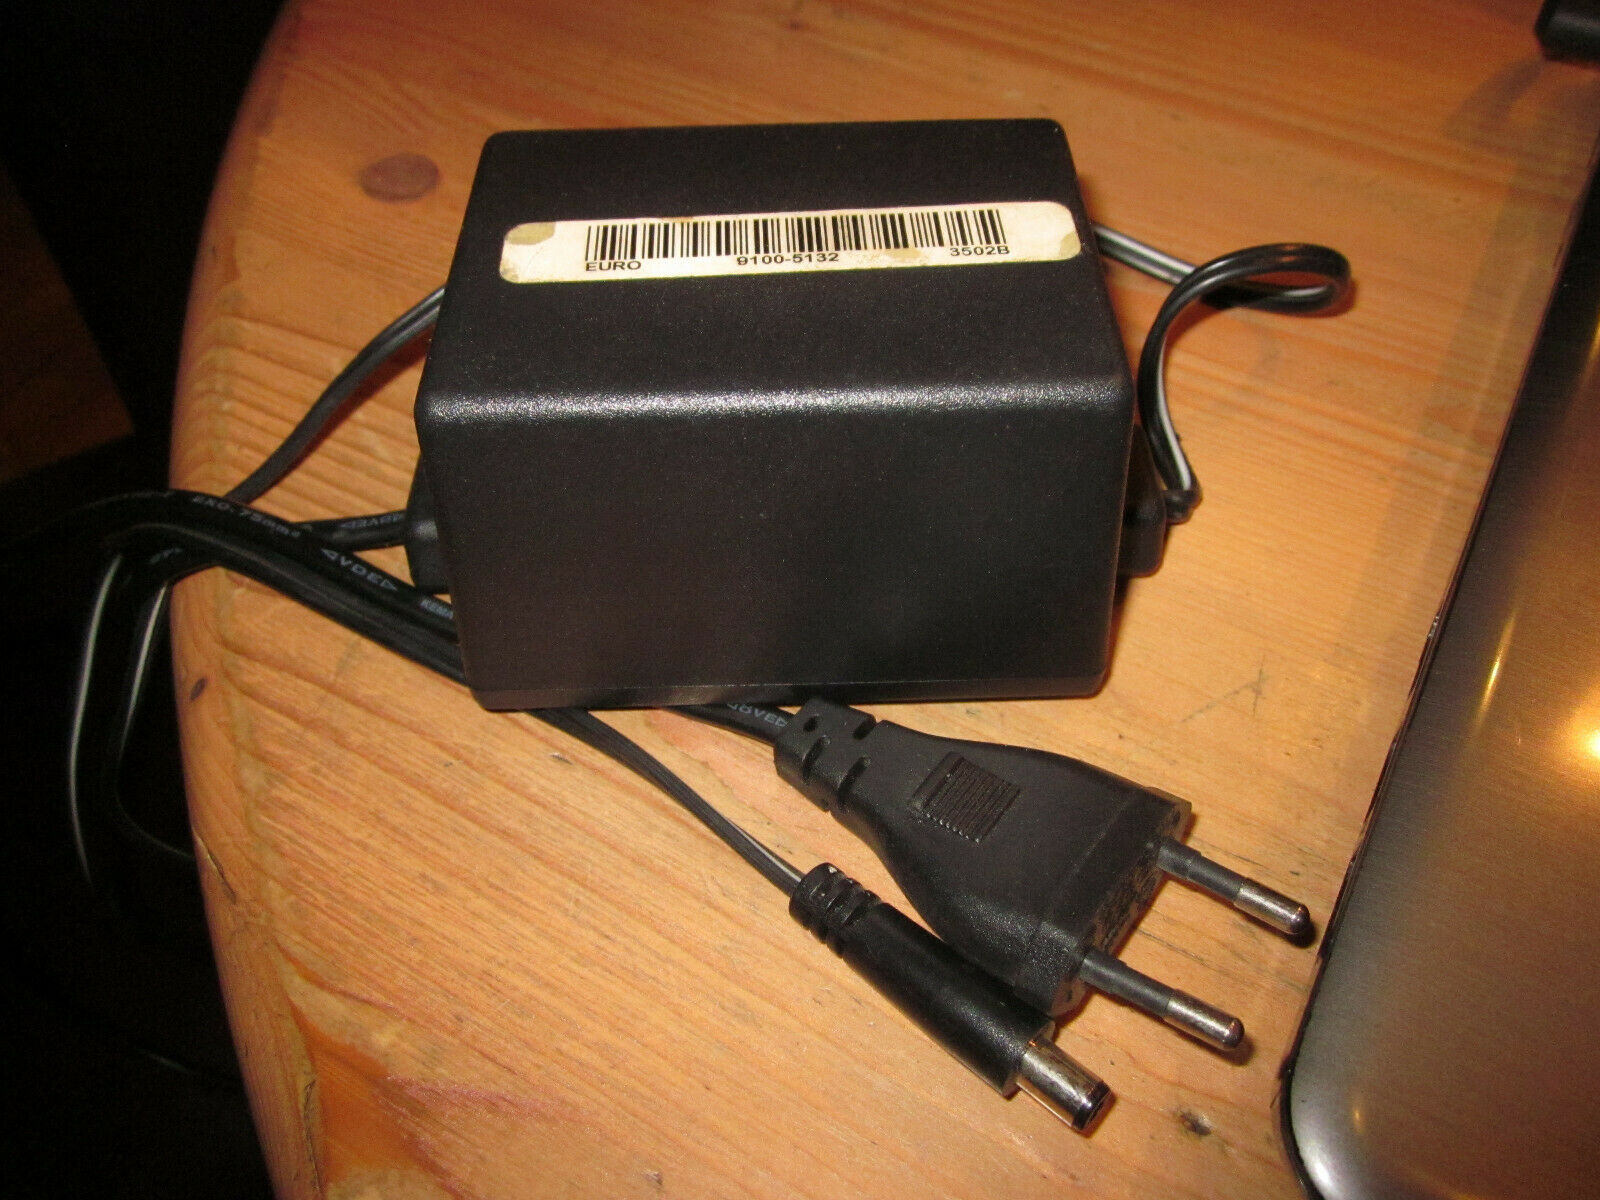 Original Netzgerät HP Hewlett Packard C2176A für Drucker Scanner ,Kombigeräte ua